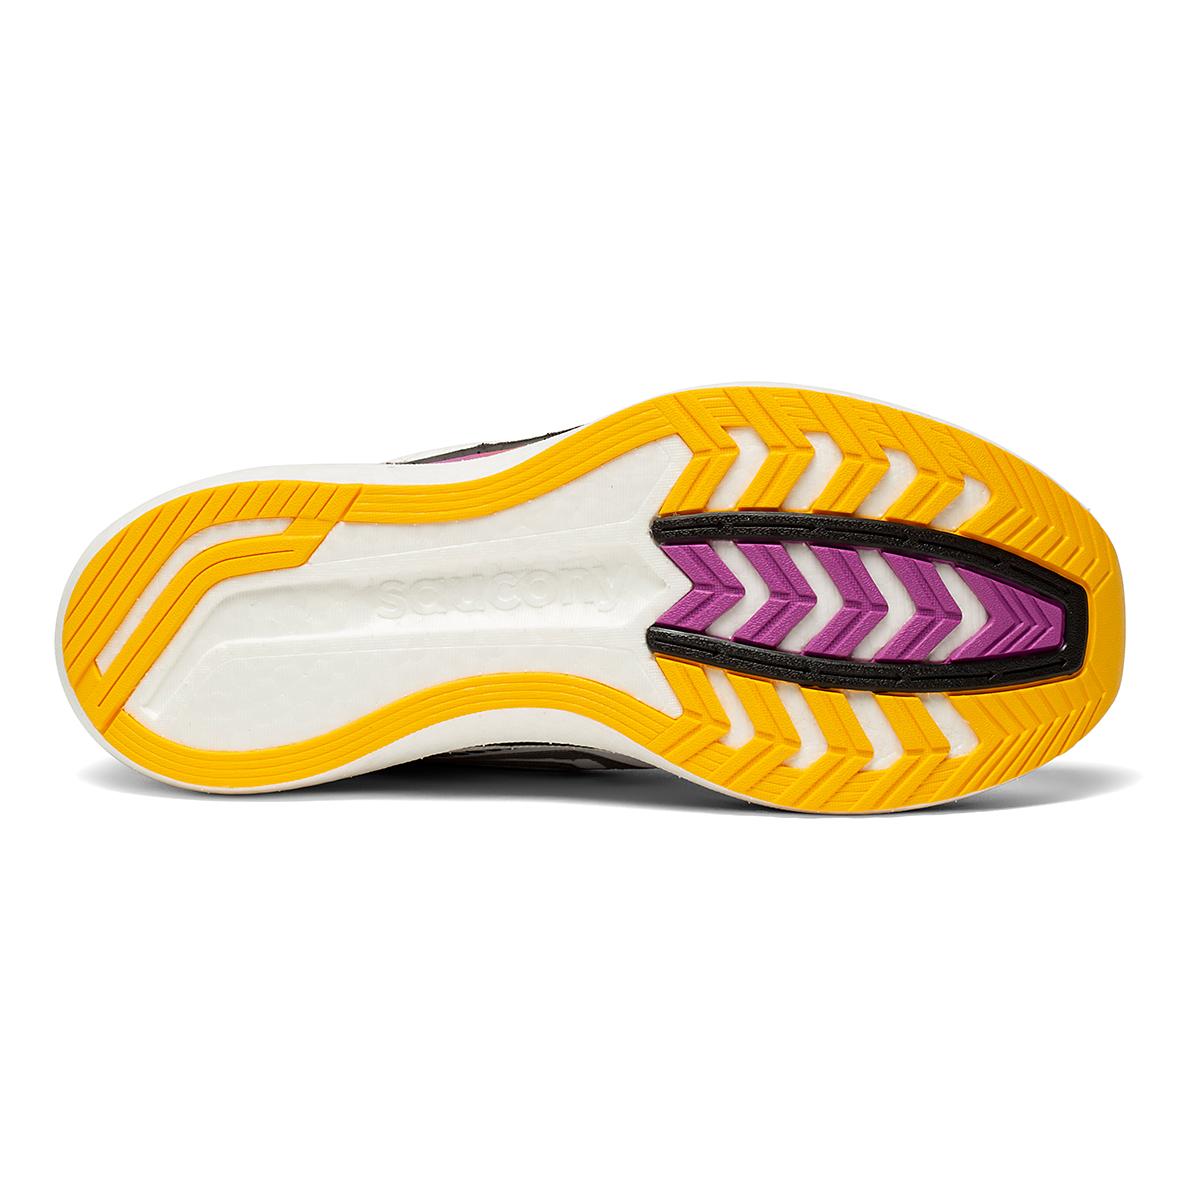 Women's Saucony Endorphin Pro 2 Running Shoe - Color: Reverie - Size: 5 - Width: Regular, Reverie, large, image 4